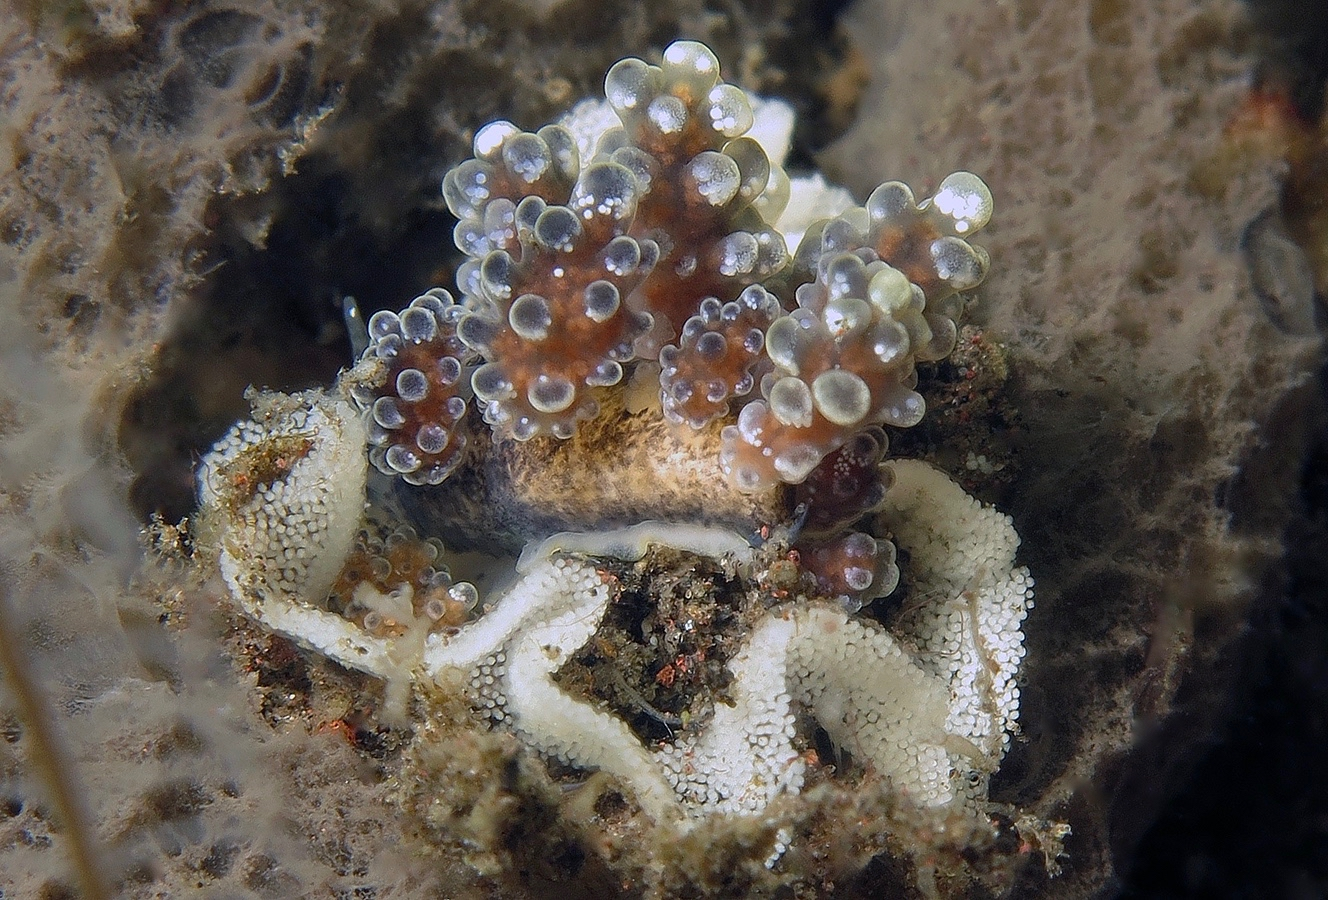 Doto sp  豆豆海蛞蝓  , 巴厘岛图蓝本 Tulamben 印度尼西亚 Indonesia @lazydiving.com 潜水时光